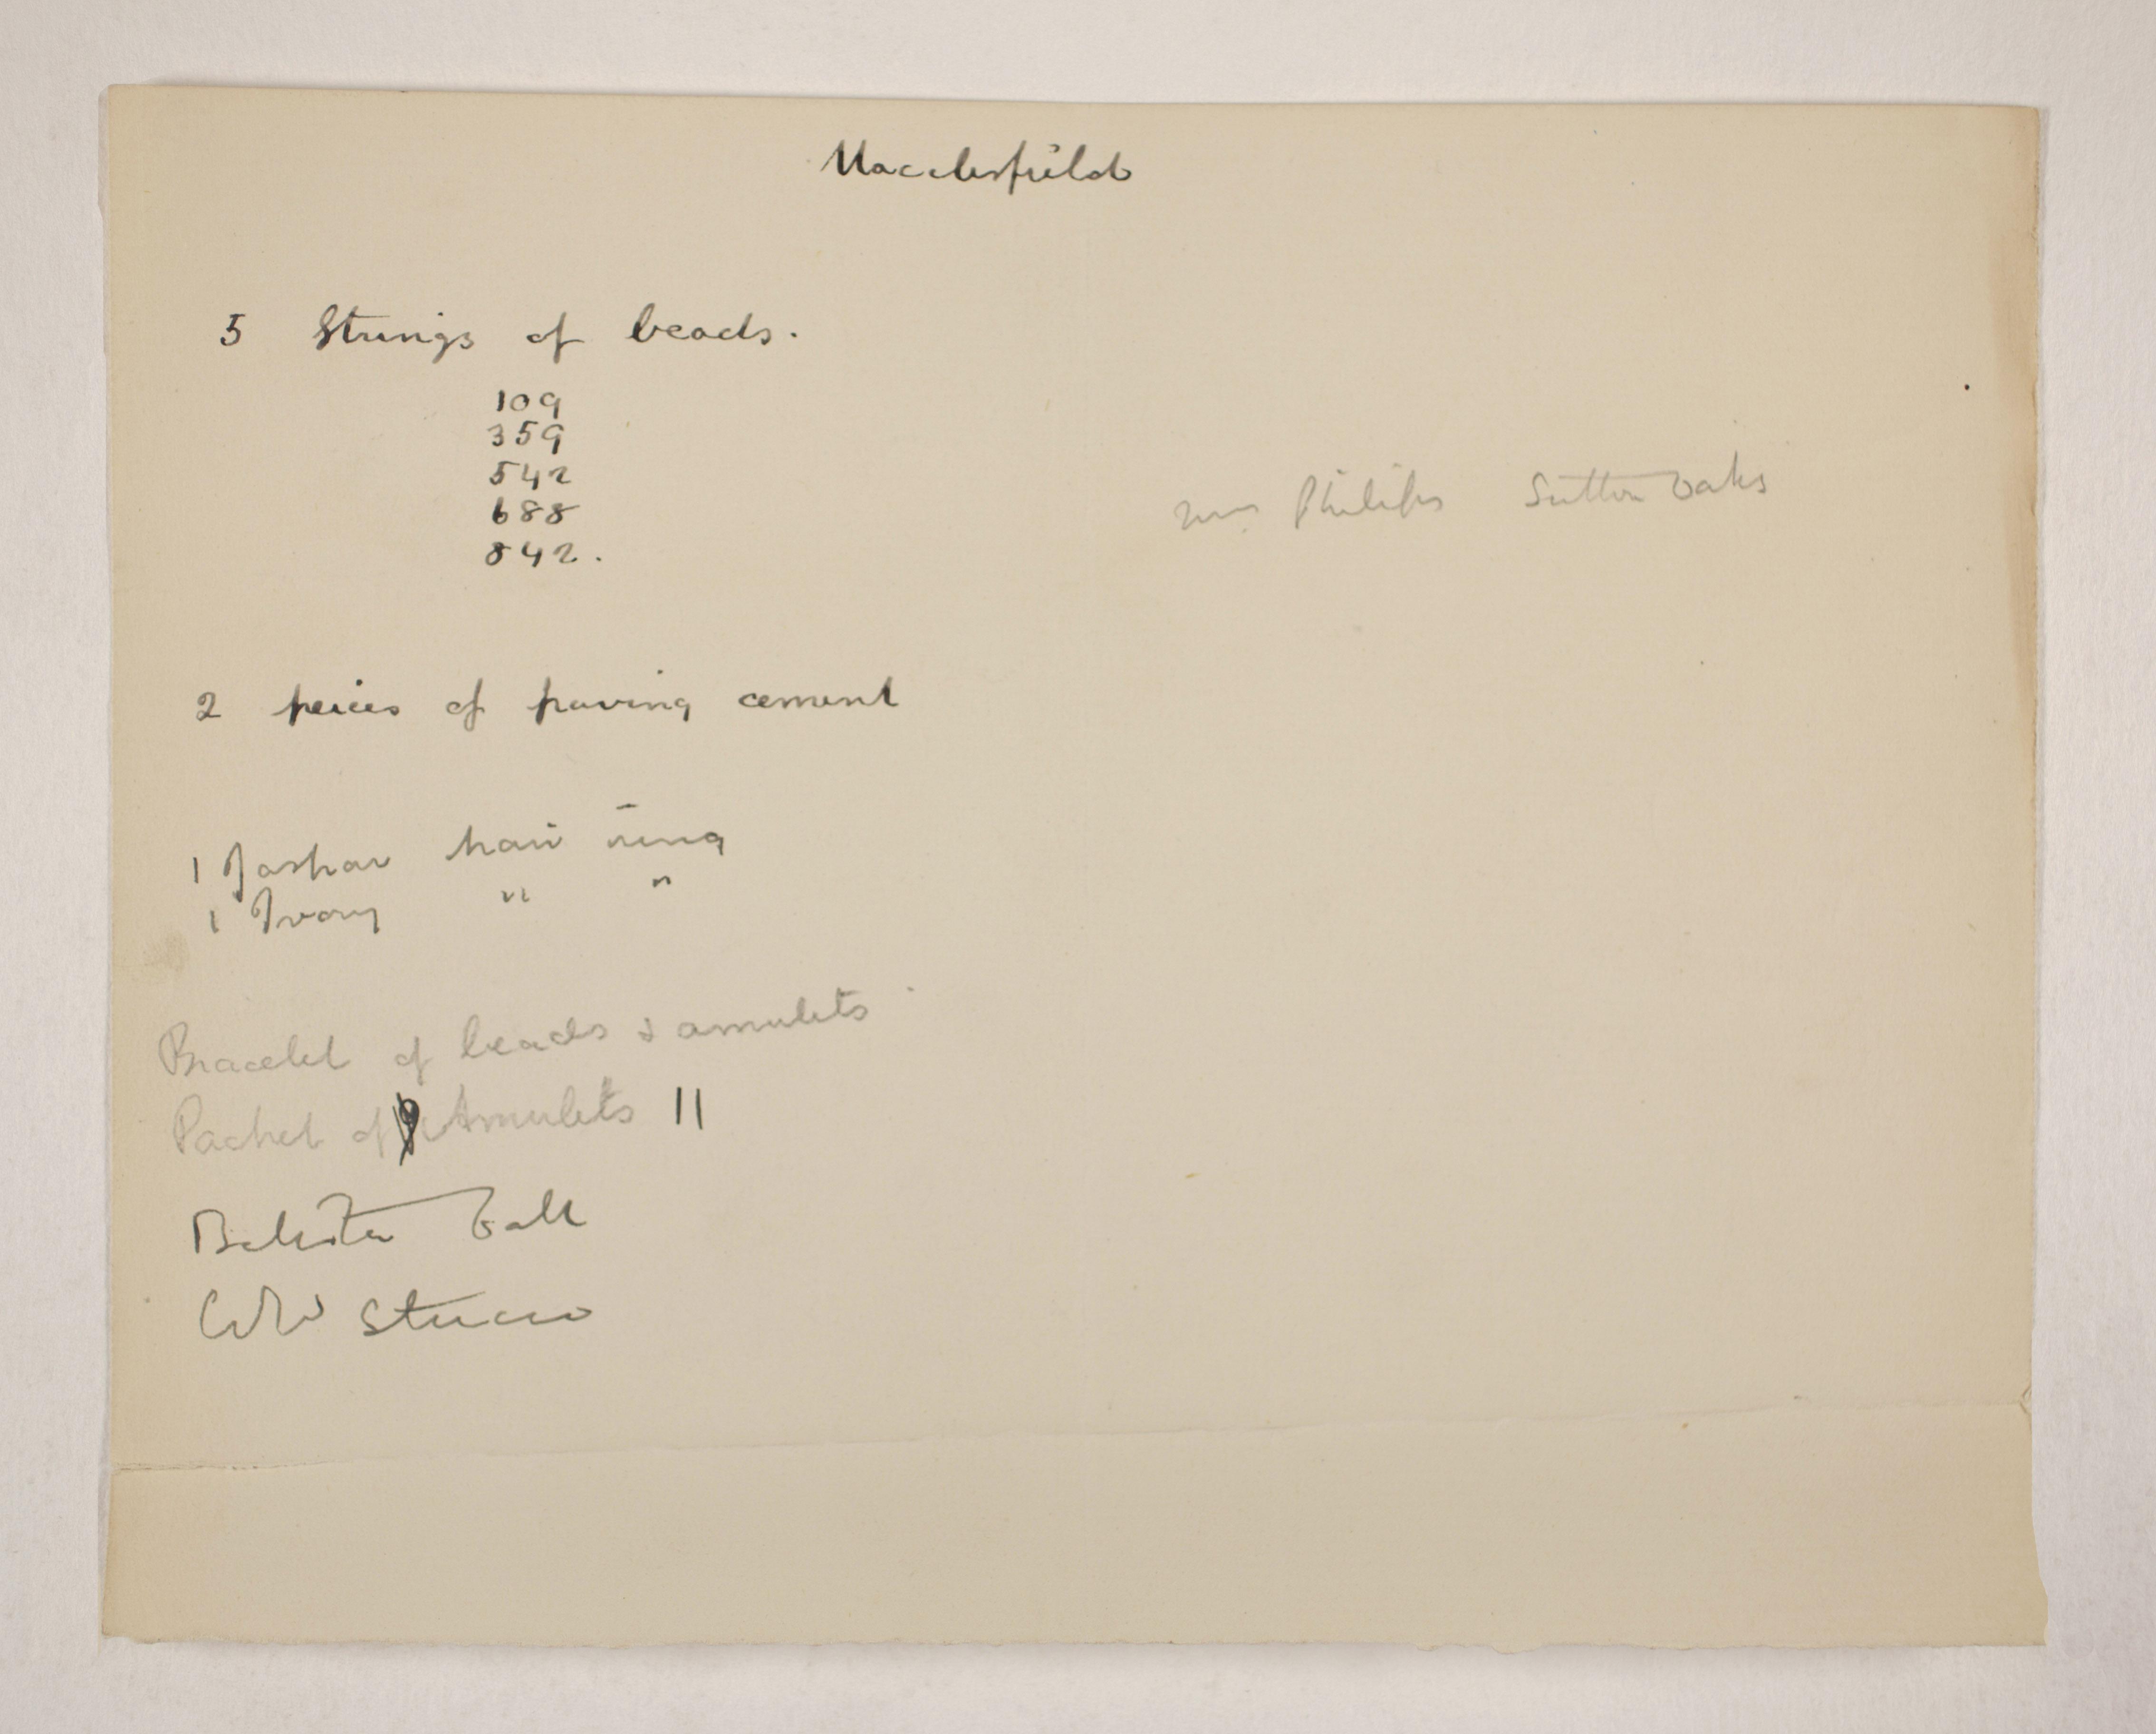 1905-06 Eastern Delta: Belbeis, Tell el-Rataba, Saft el-Hinna, Tell el-Yahudiya, Shaghanbeh, Ghita Individual institution list  PMA/WFP1/D/14/17